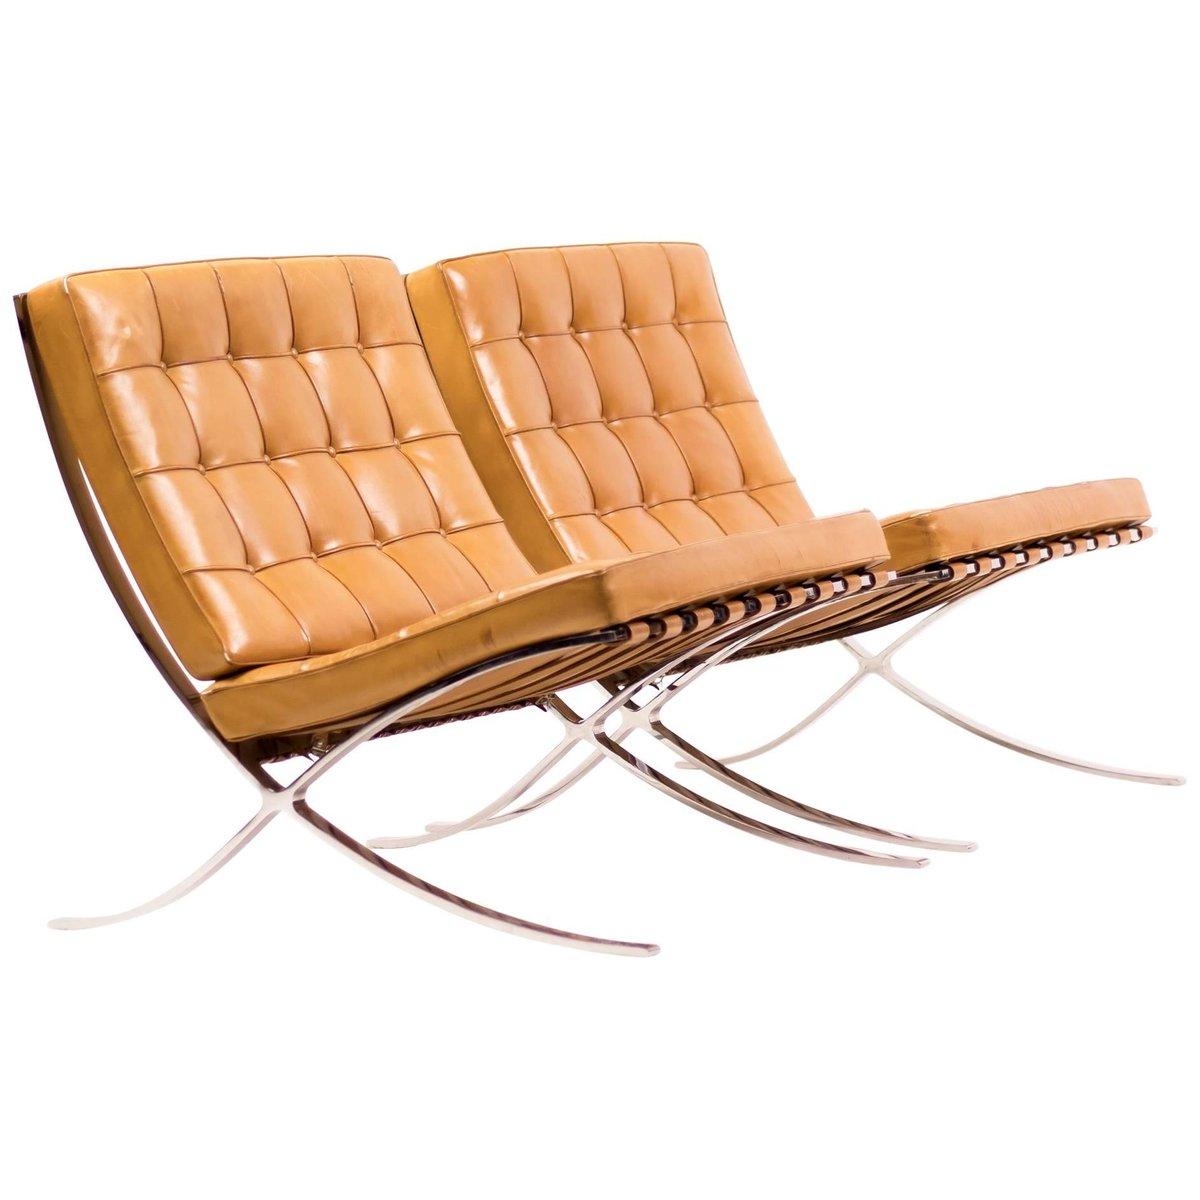 Cognacfarbene Barcelona Stühle Aus Leder Von Ludwig Mies Van Der